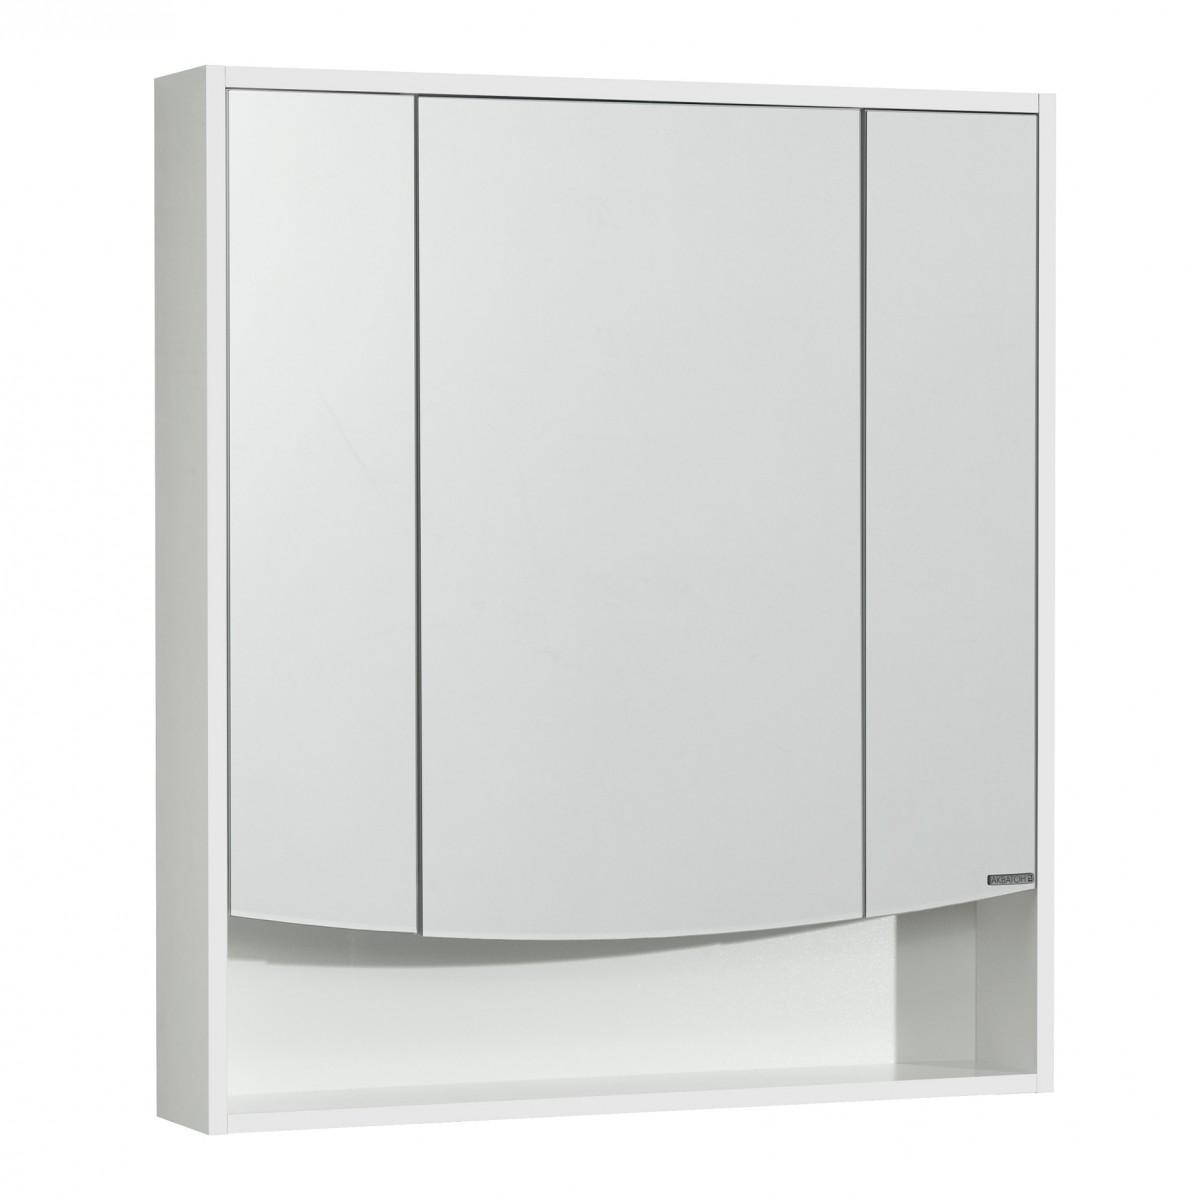 Зеркальный шкаф Акватон Инфинити 76 белый